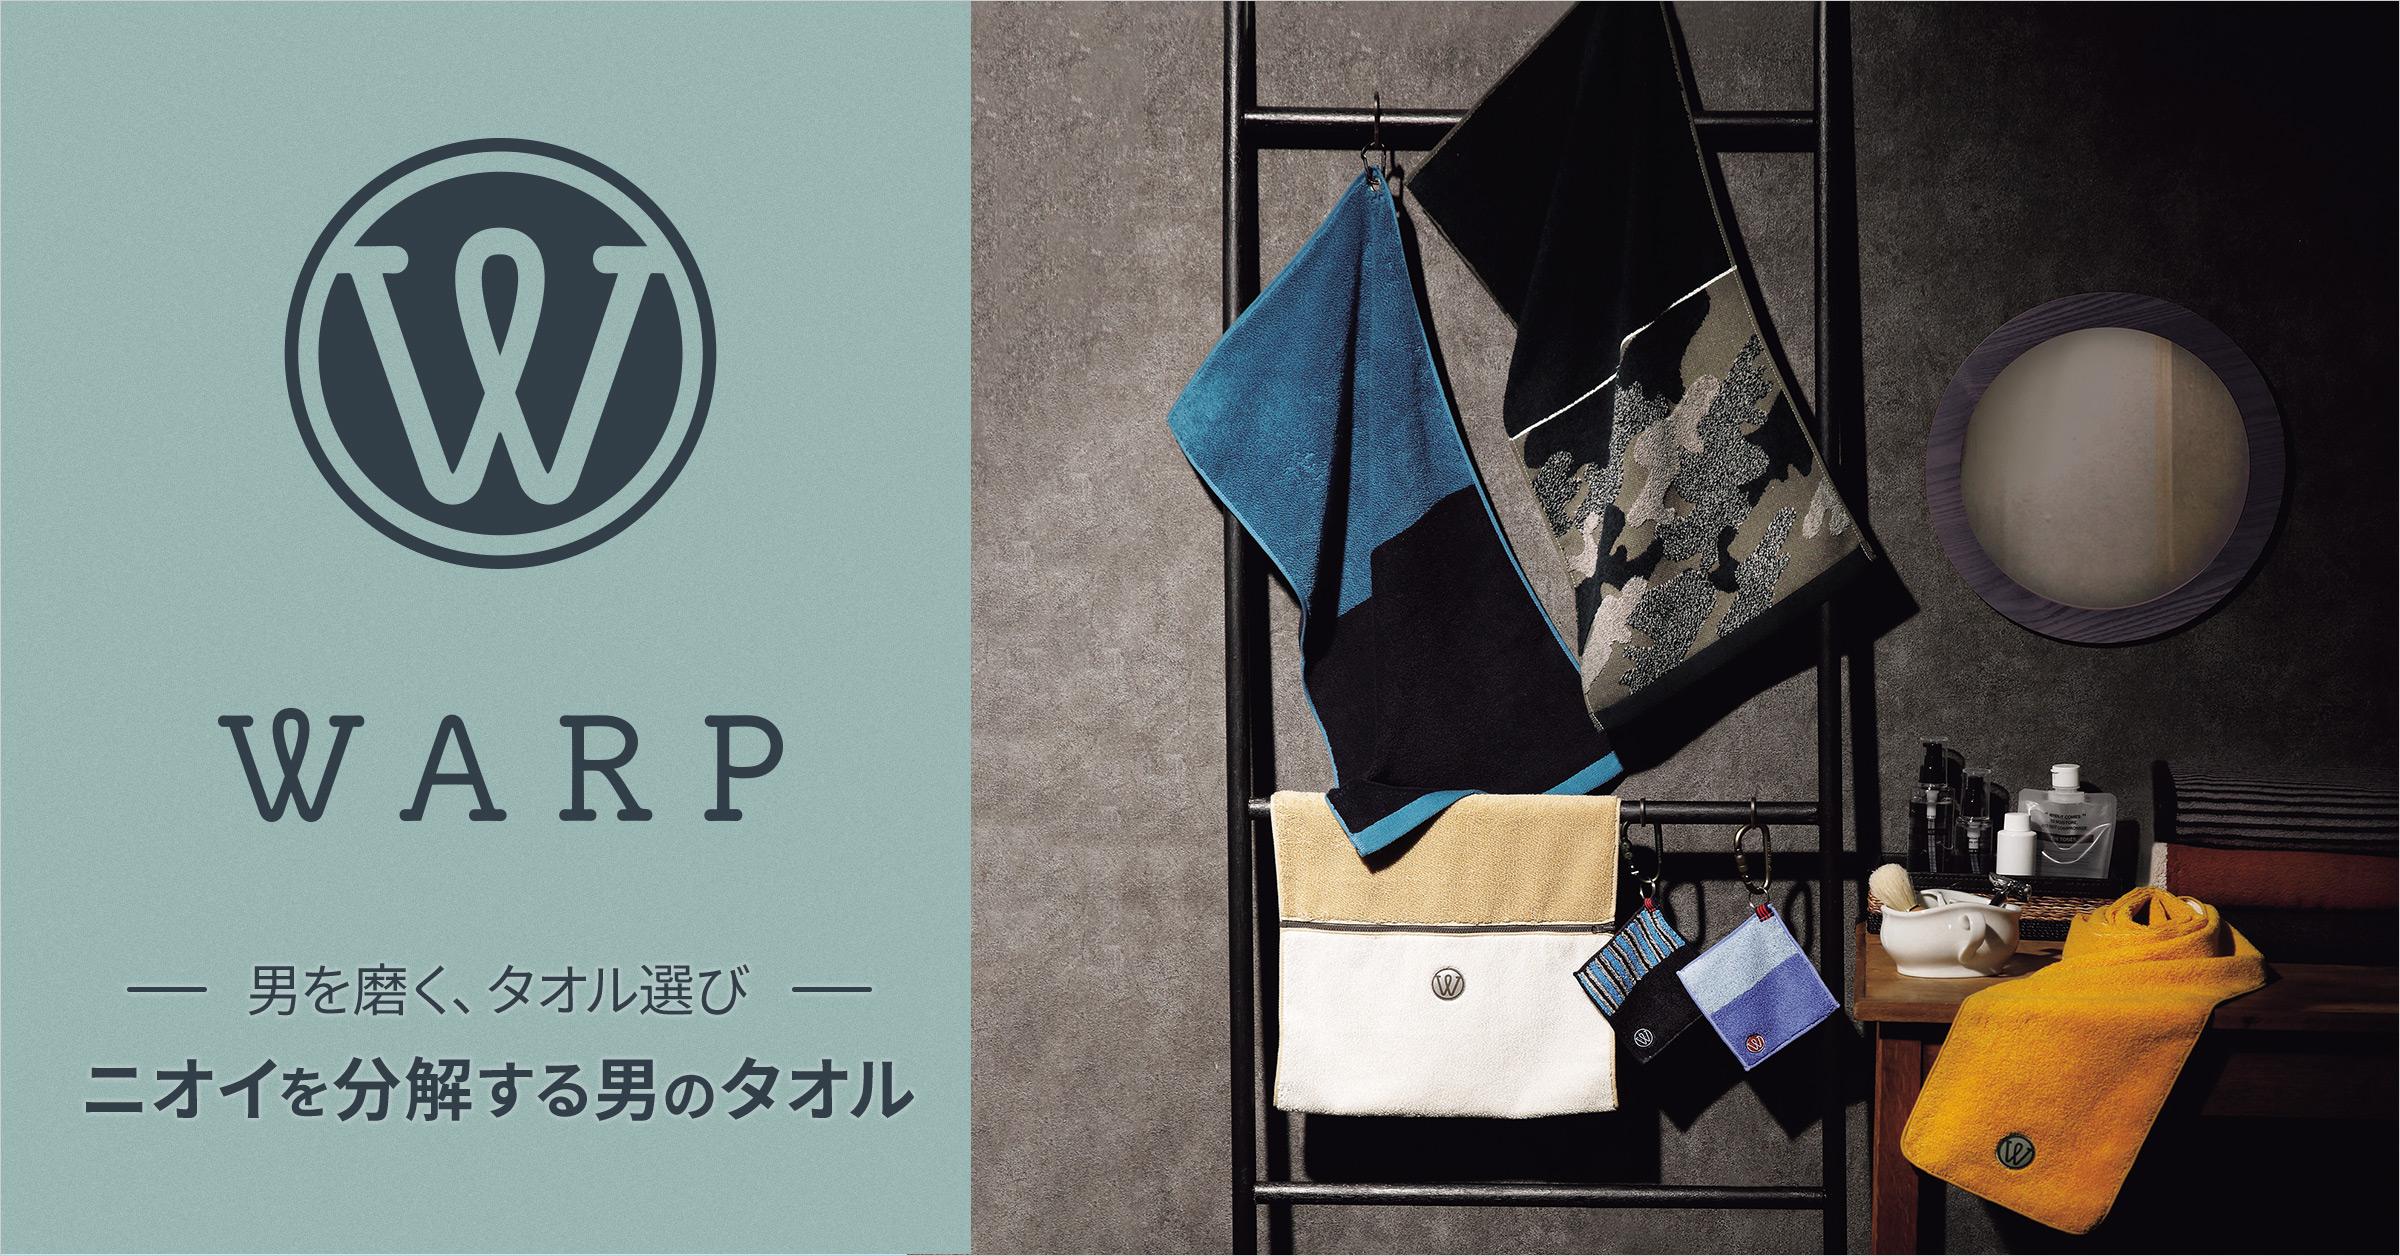 【WARP】男を磨く、タオル選び ニオイを分解する男のタオル